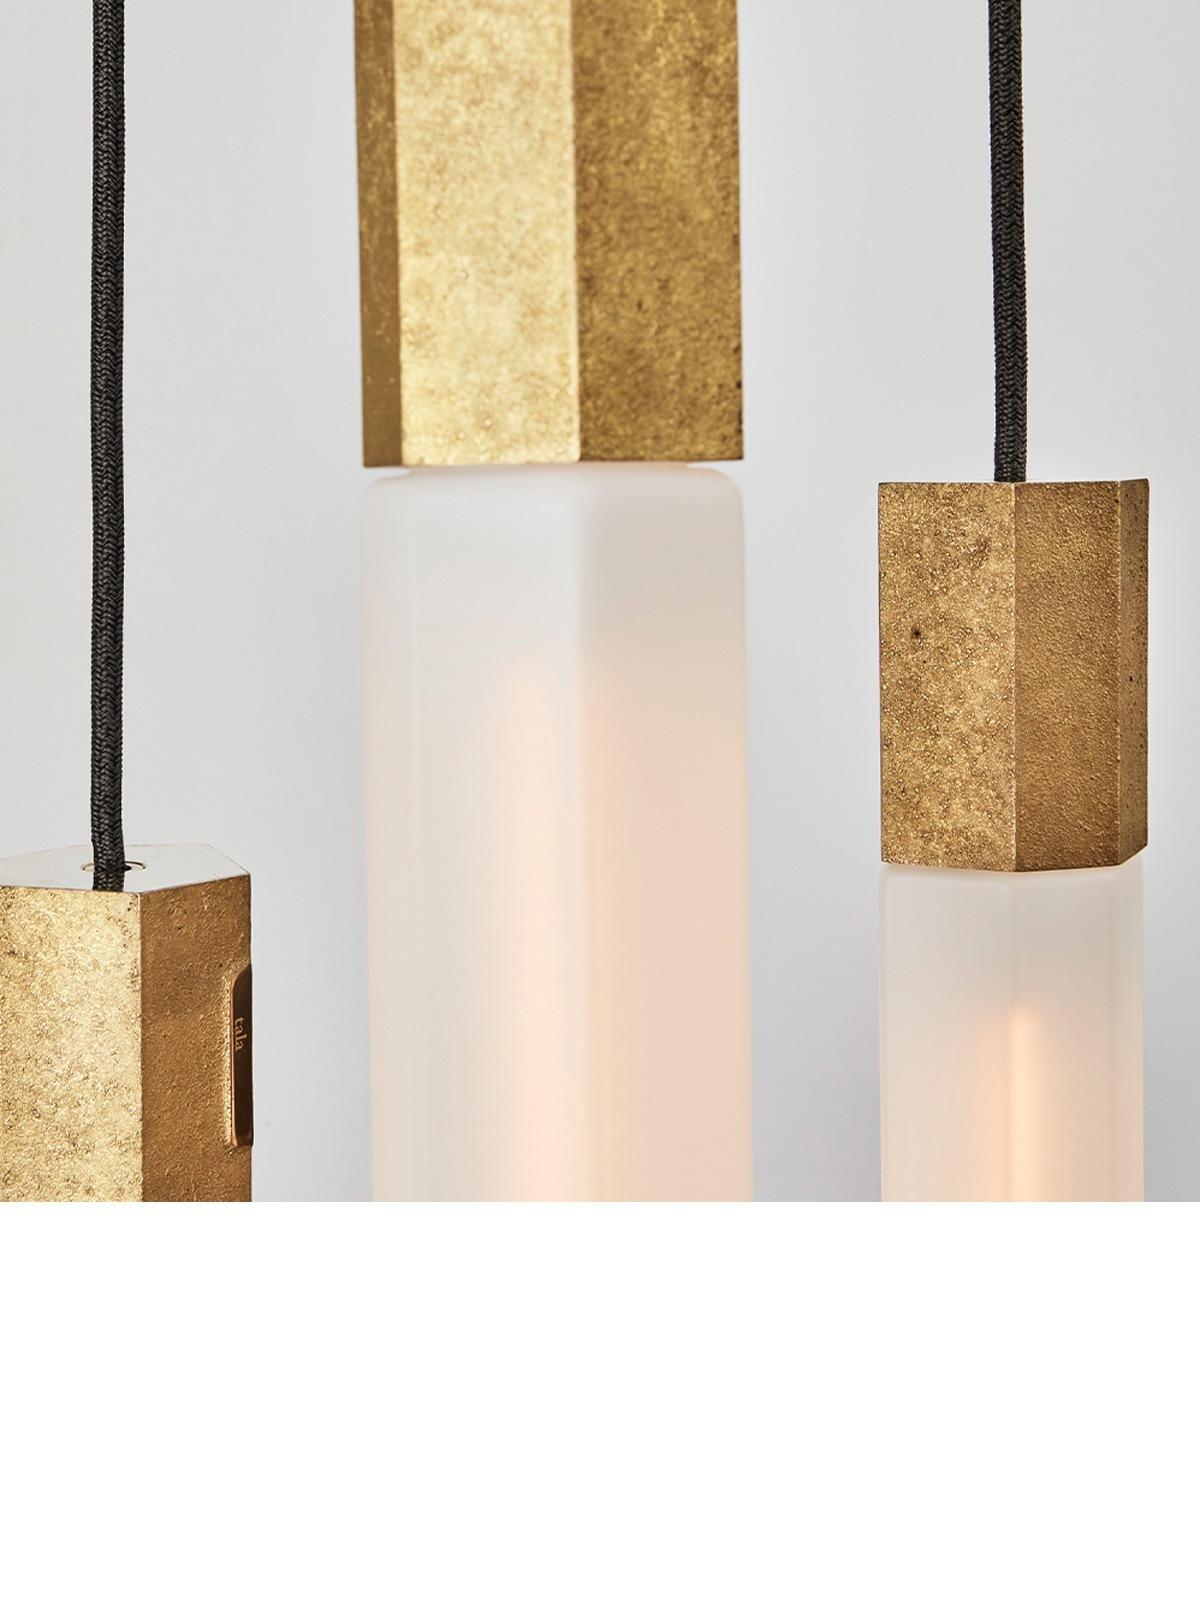 Tala Basalt Pendant Leuchten Designort Lampen Onlineshop Berlin